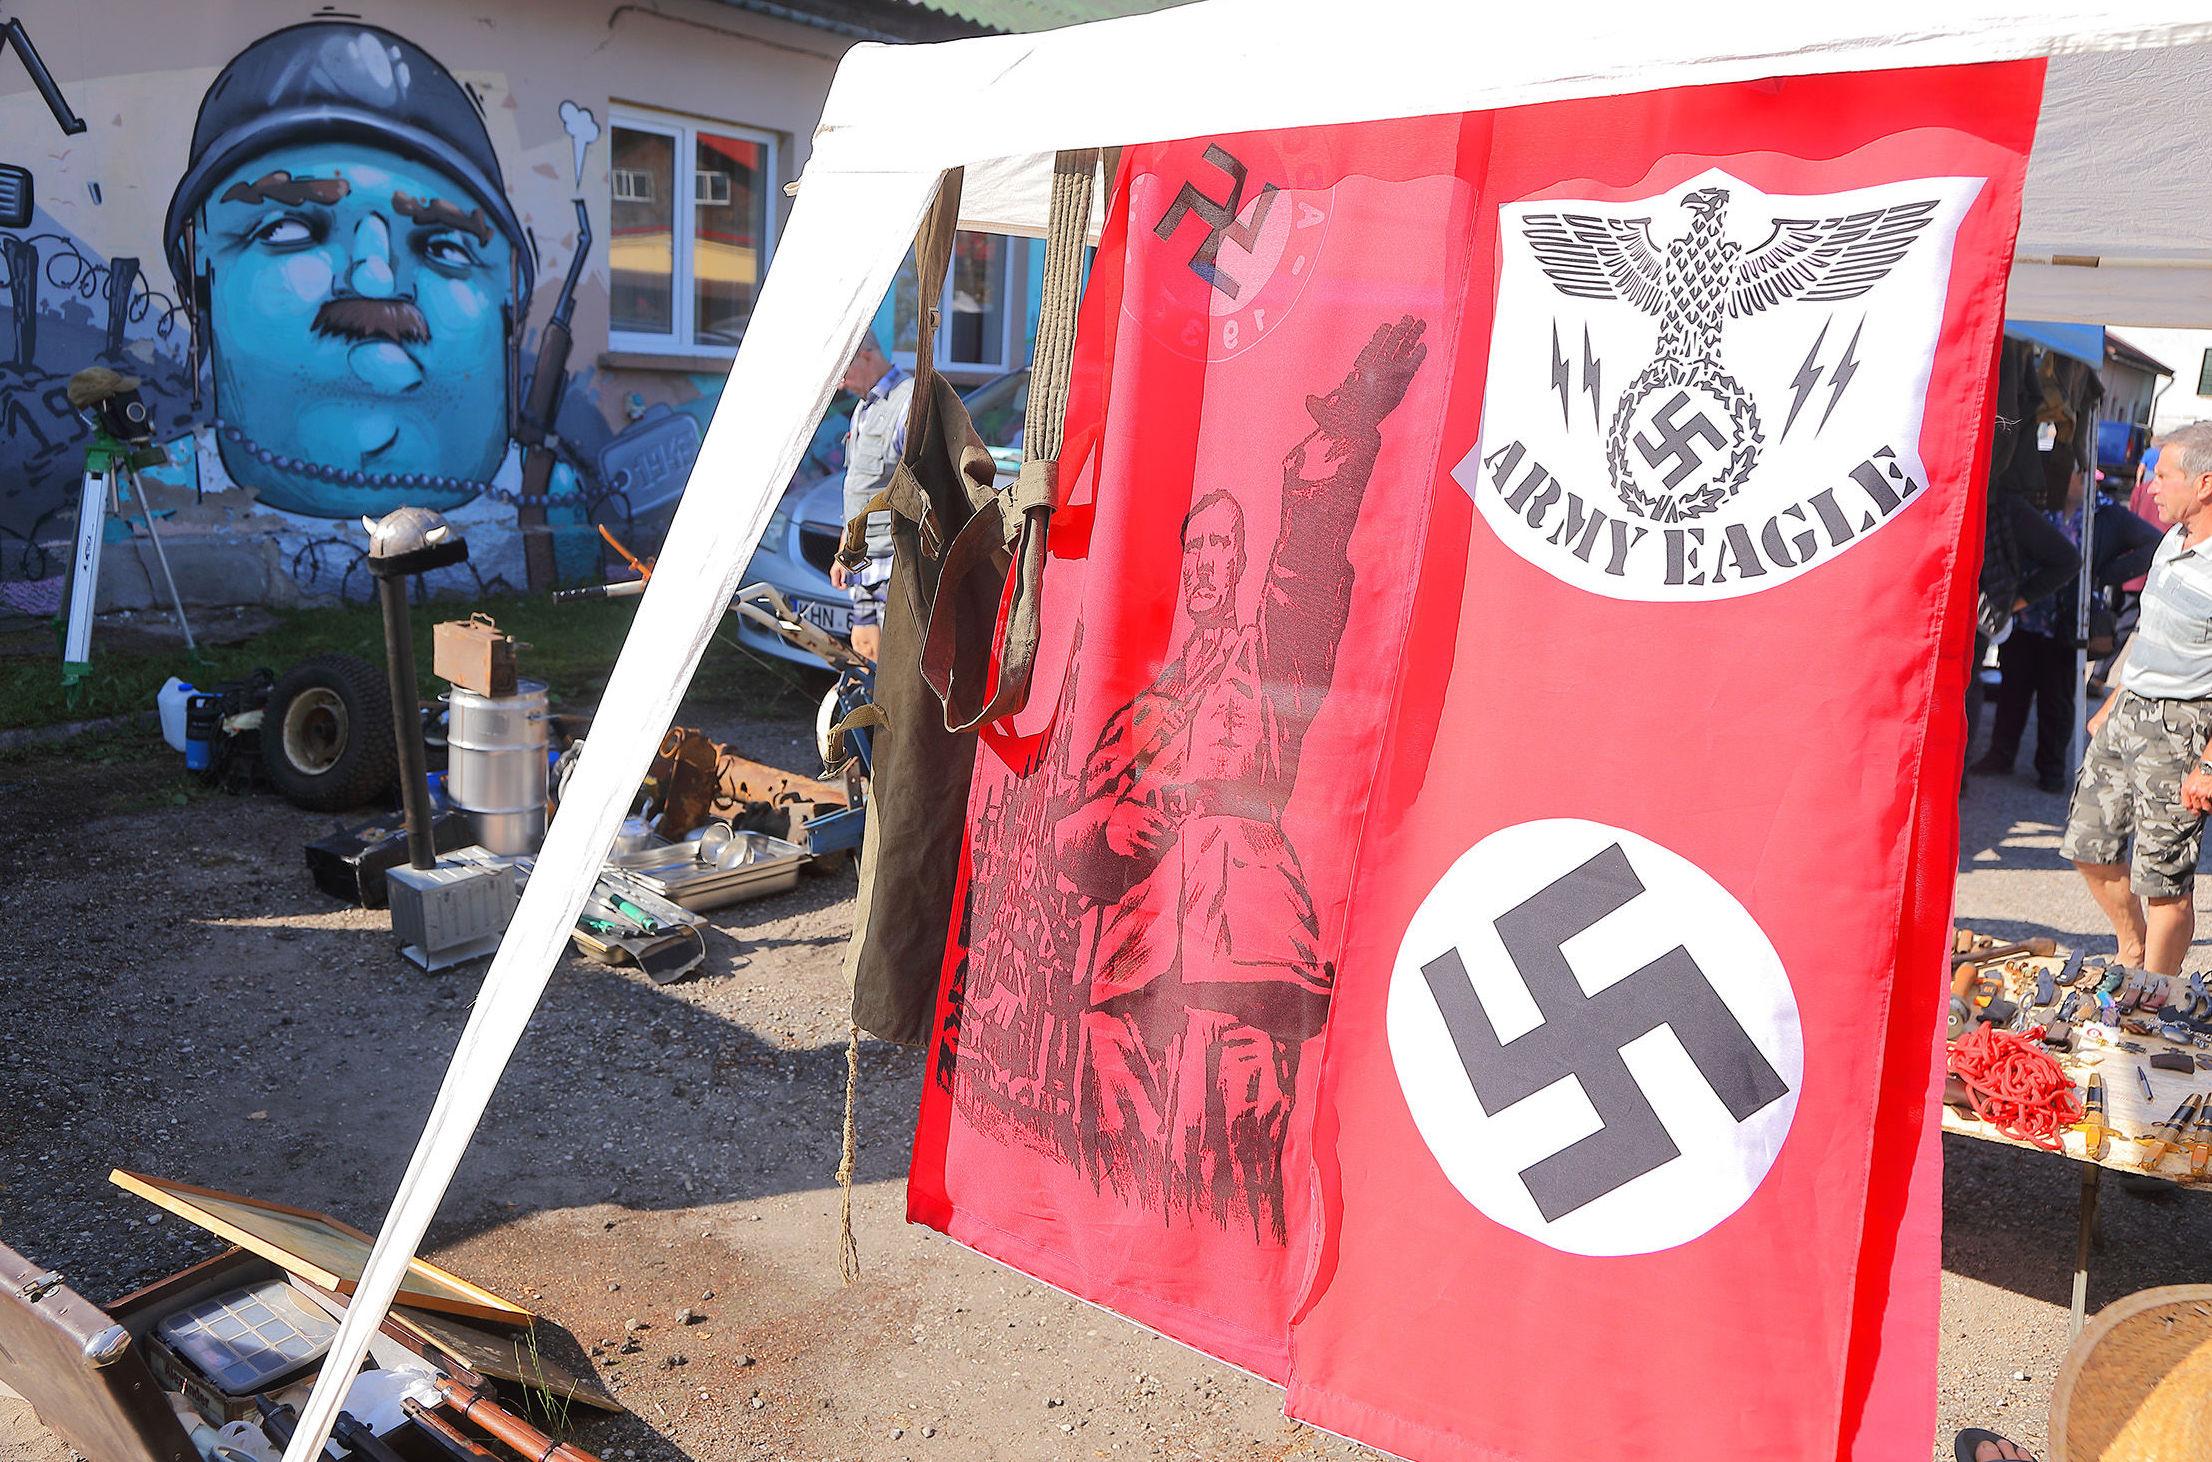 "Рынок ""нацистской продукции"" на базе НАТО в Эстонии: Магнитик с улыбкой нациста и пиво с запахом свастики"